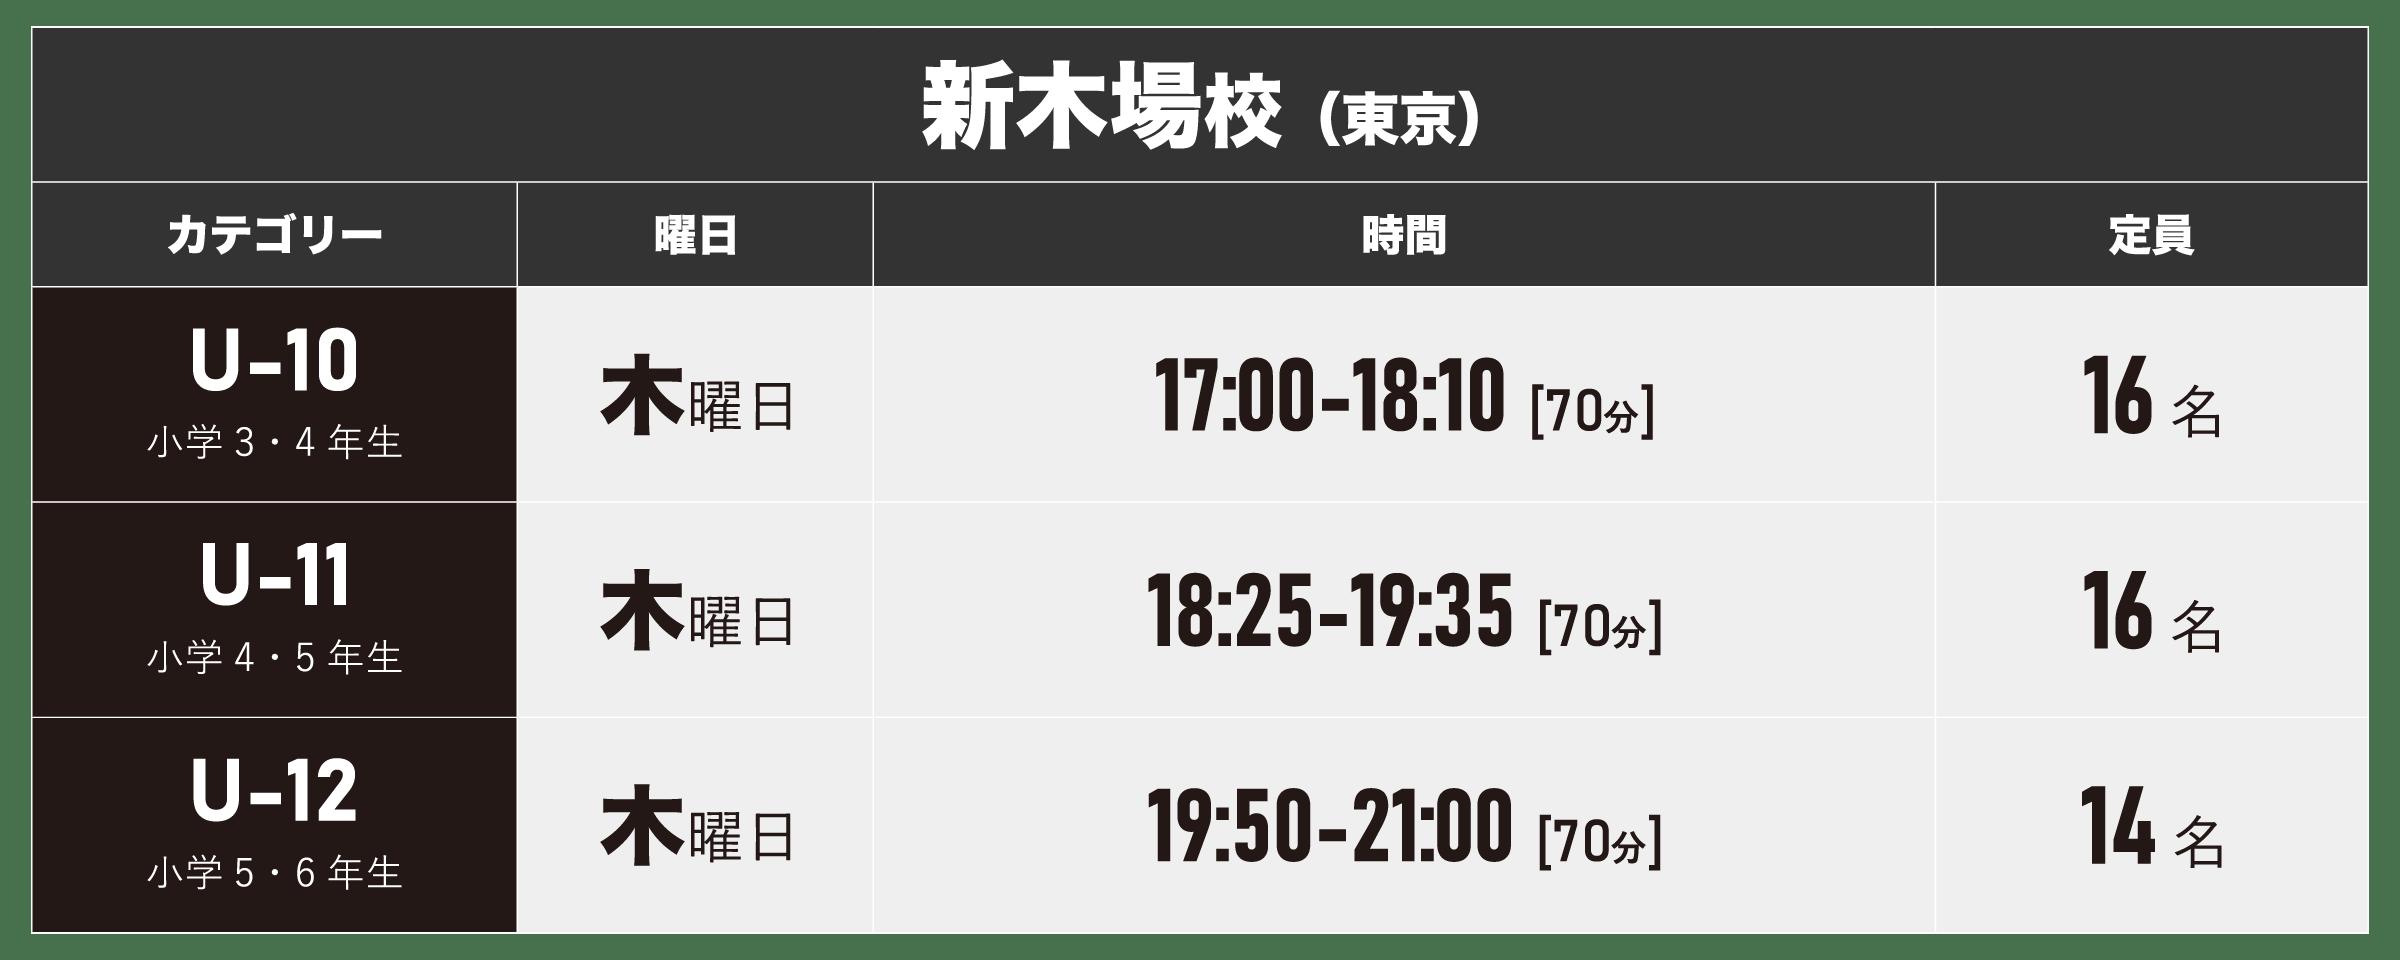 t_shinkiba_20210825